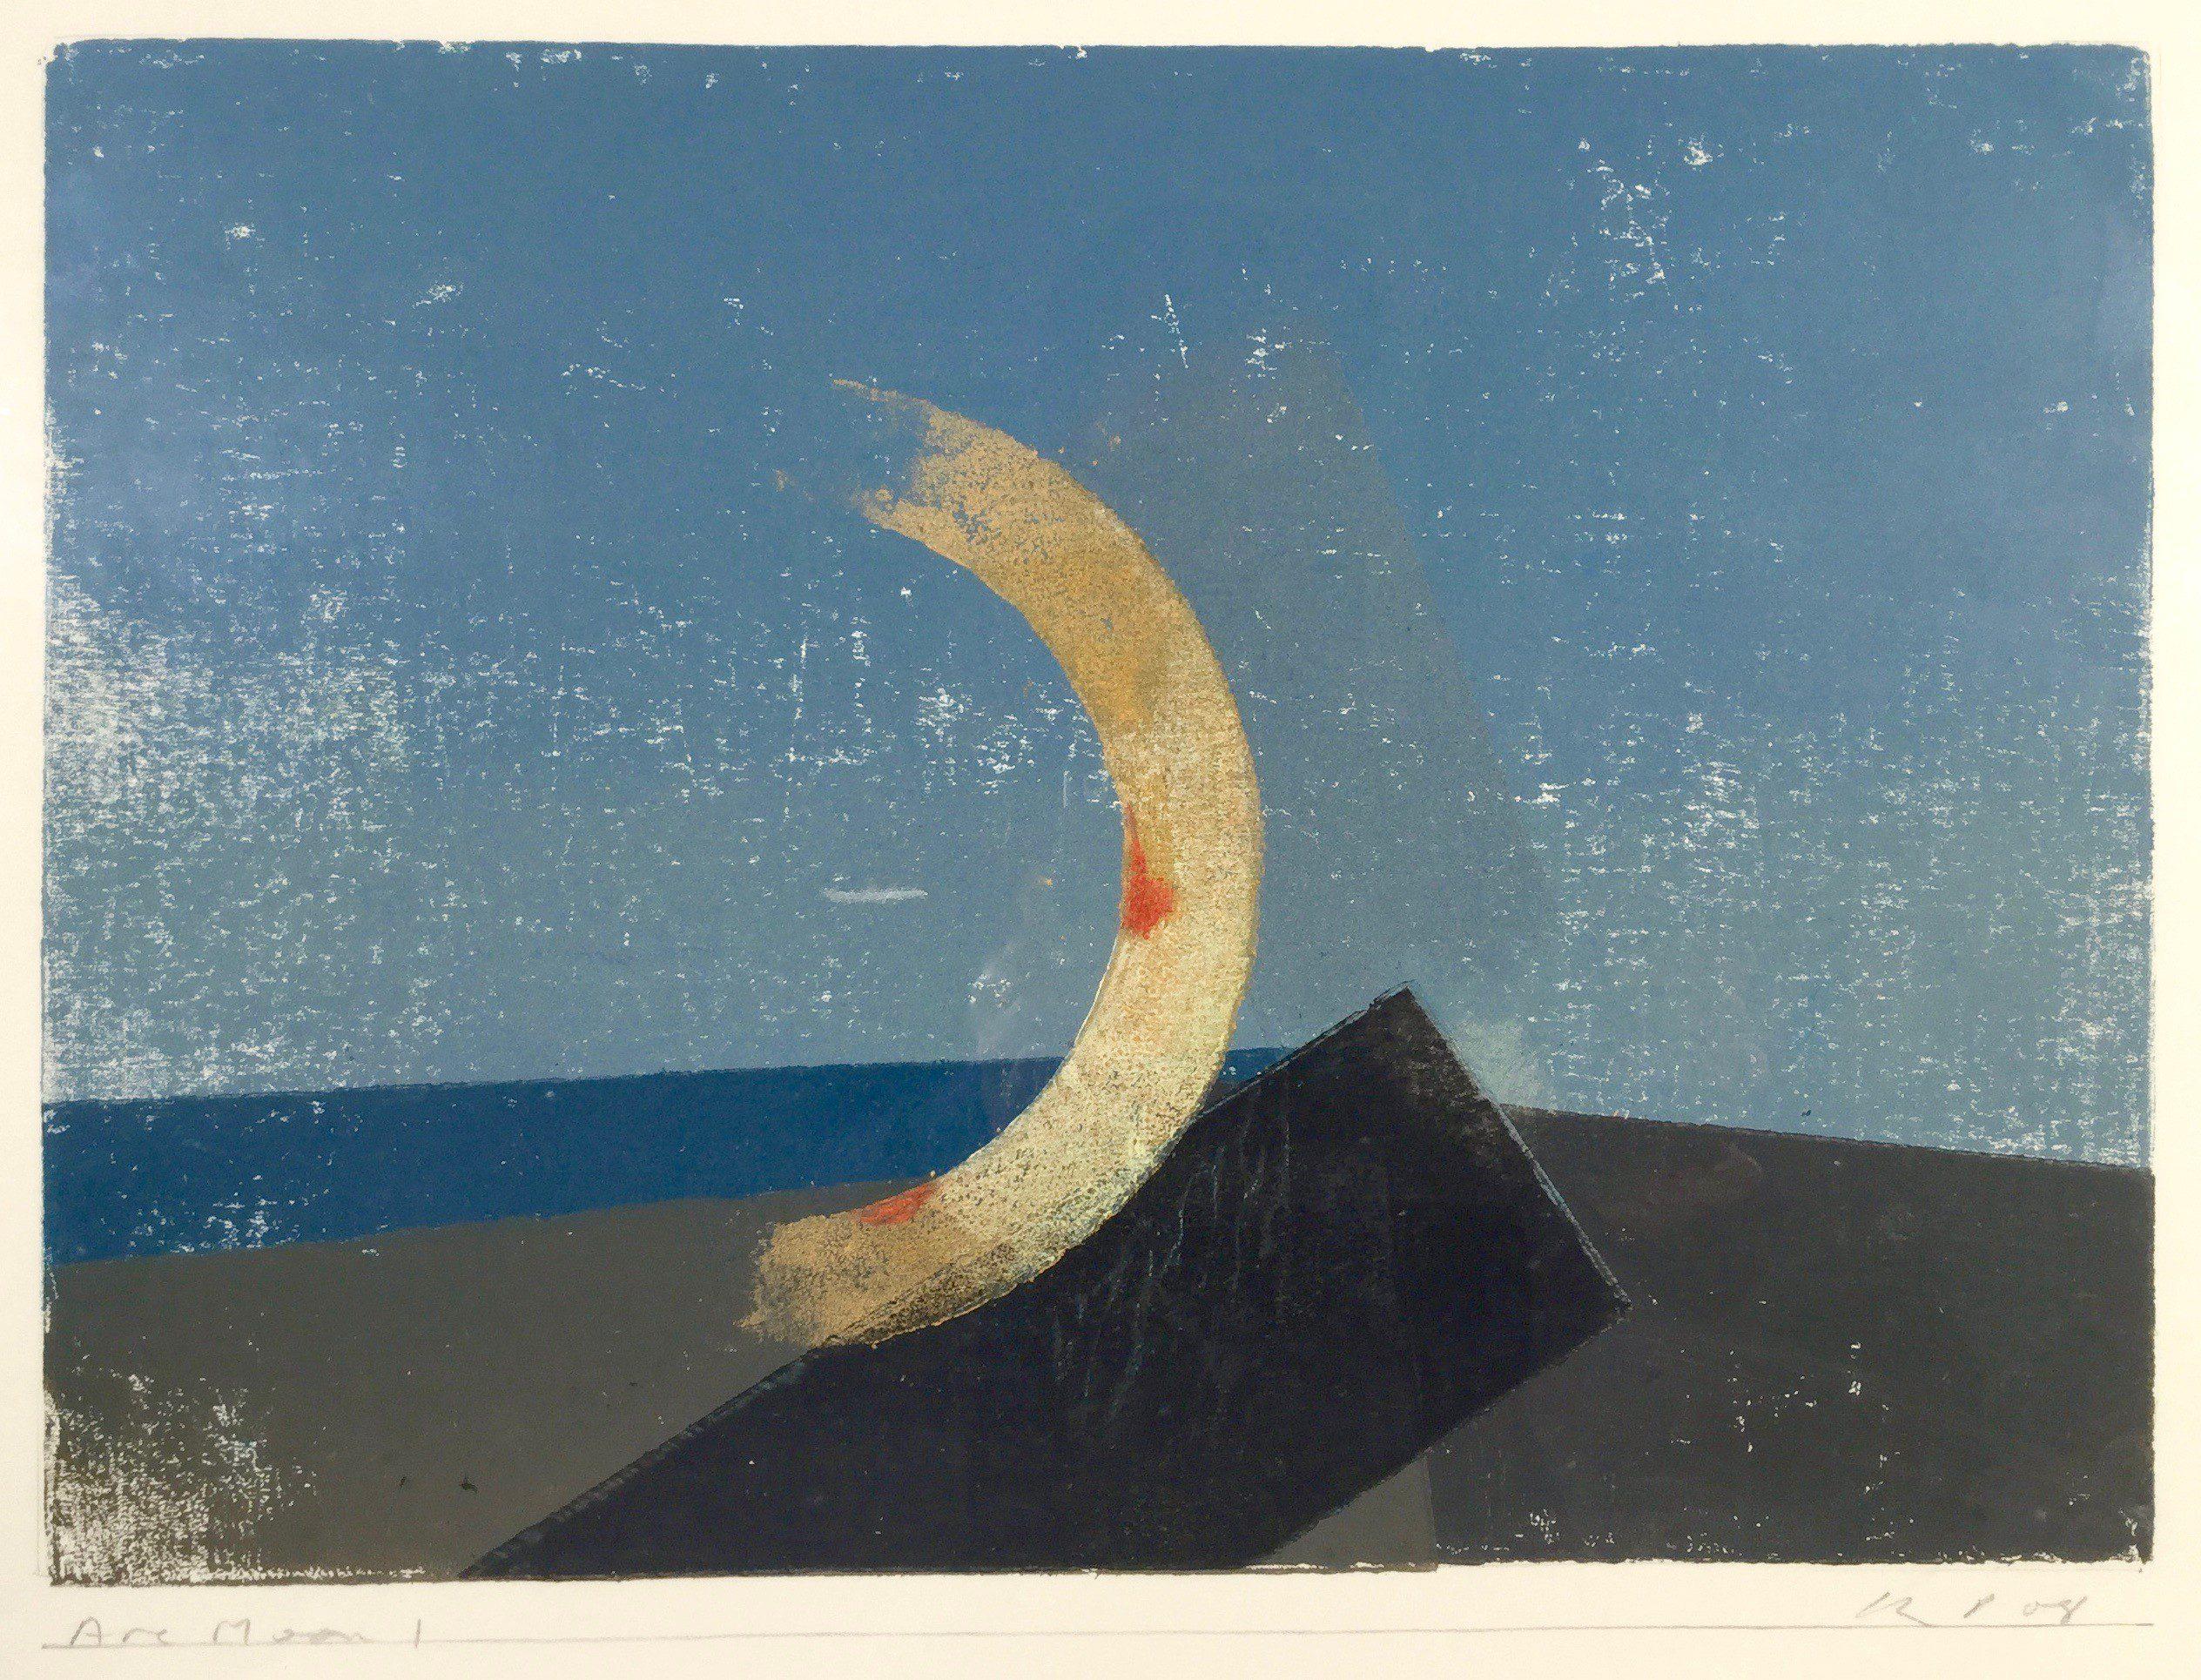 Keith Purser, Arc Moon 1, 2008, Courtesy of Jenna Burlingham Fine Art